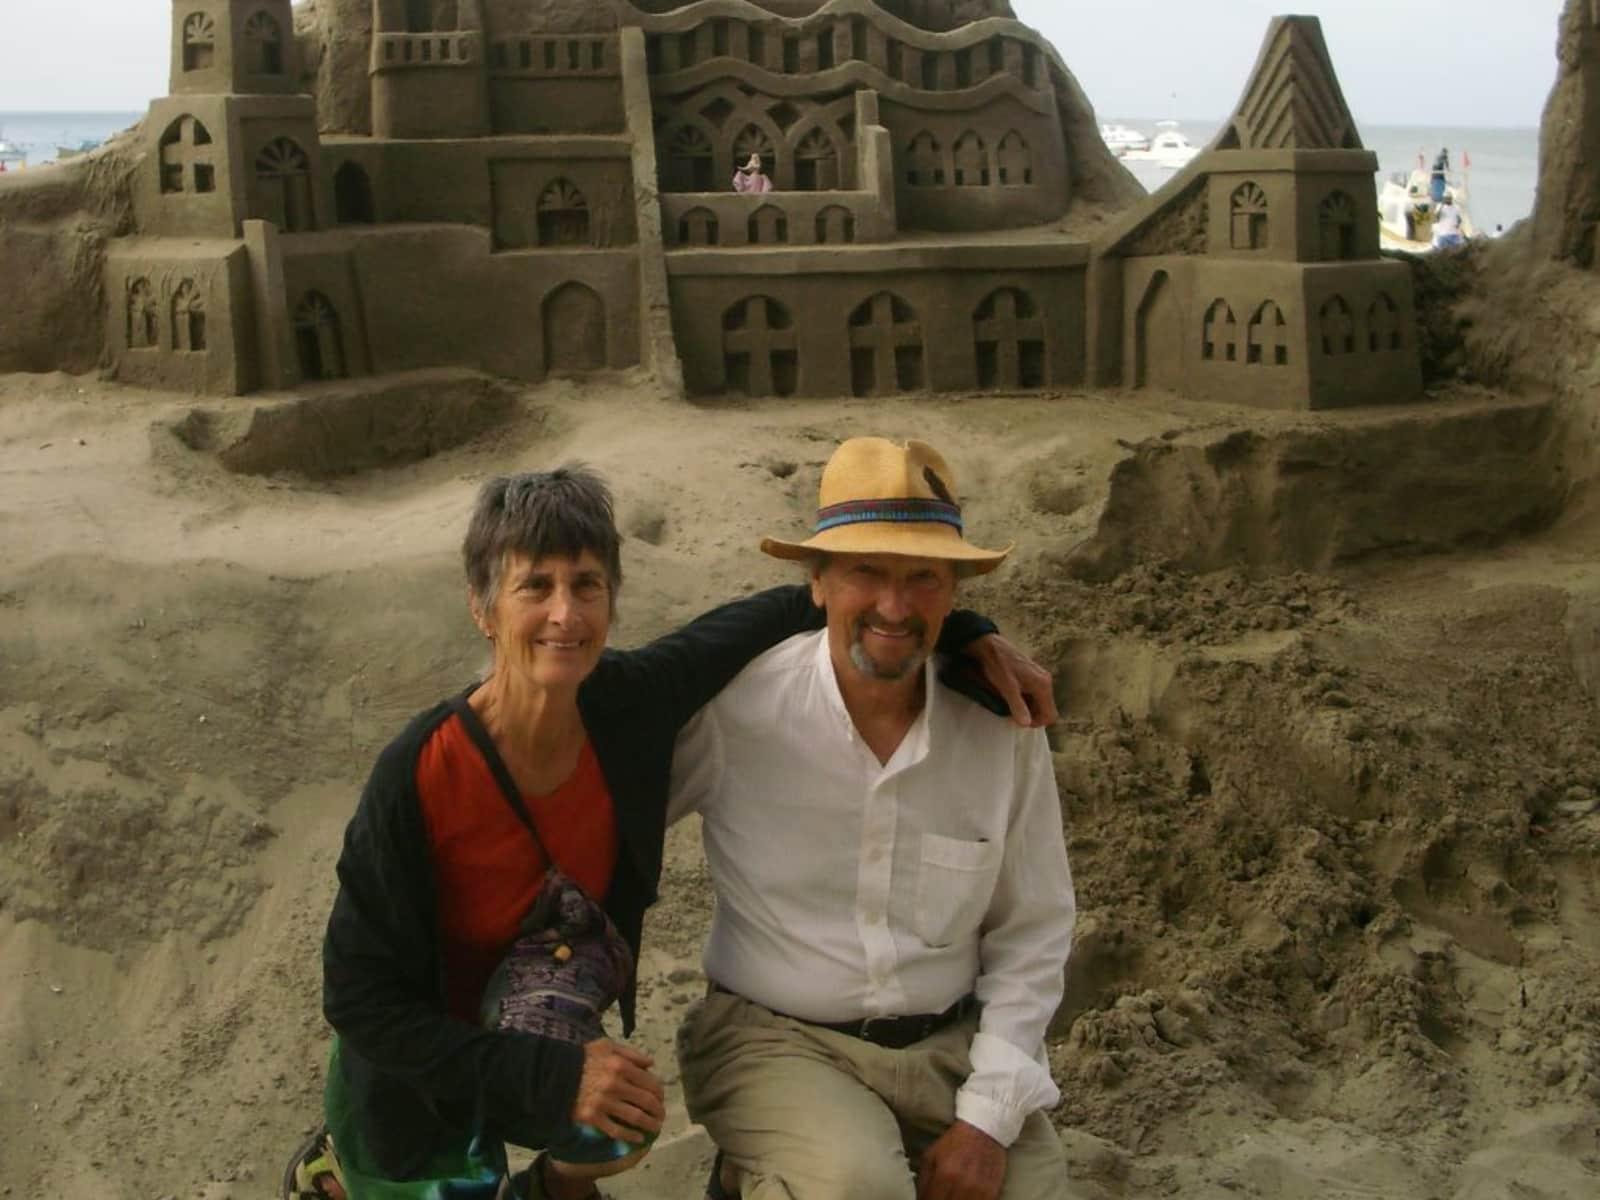 Jacqui & David from Maricopa, Arizona, United States